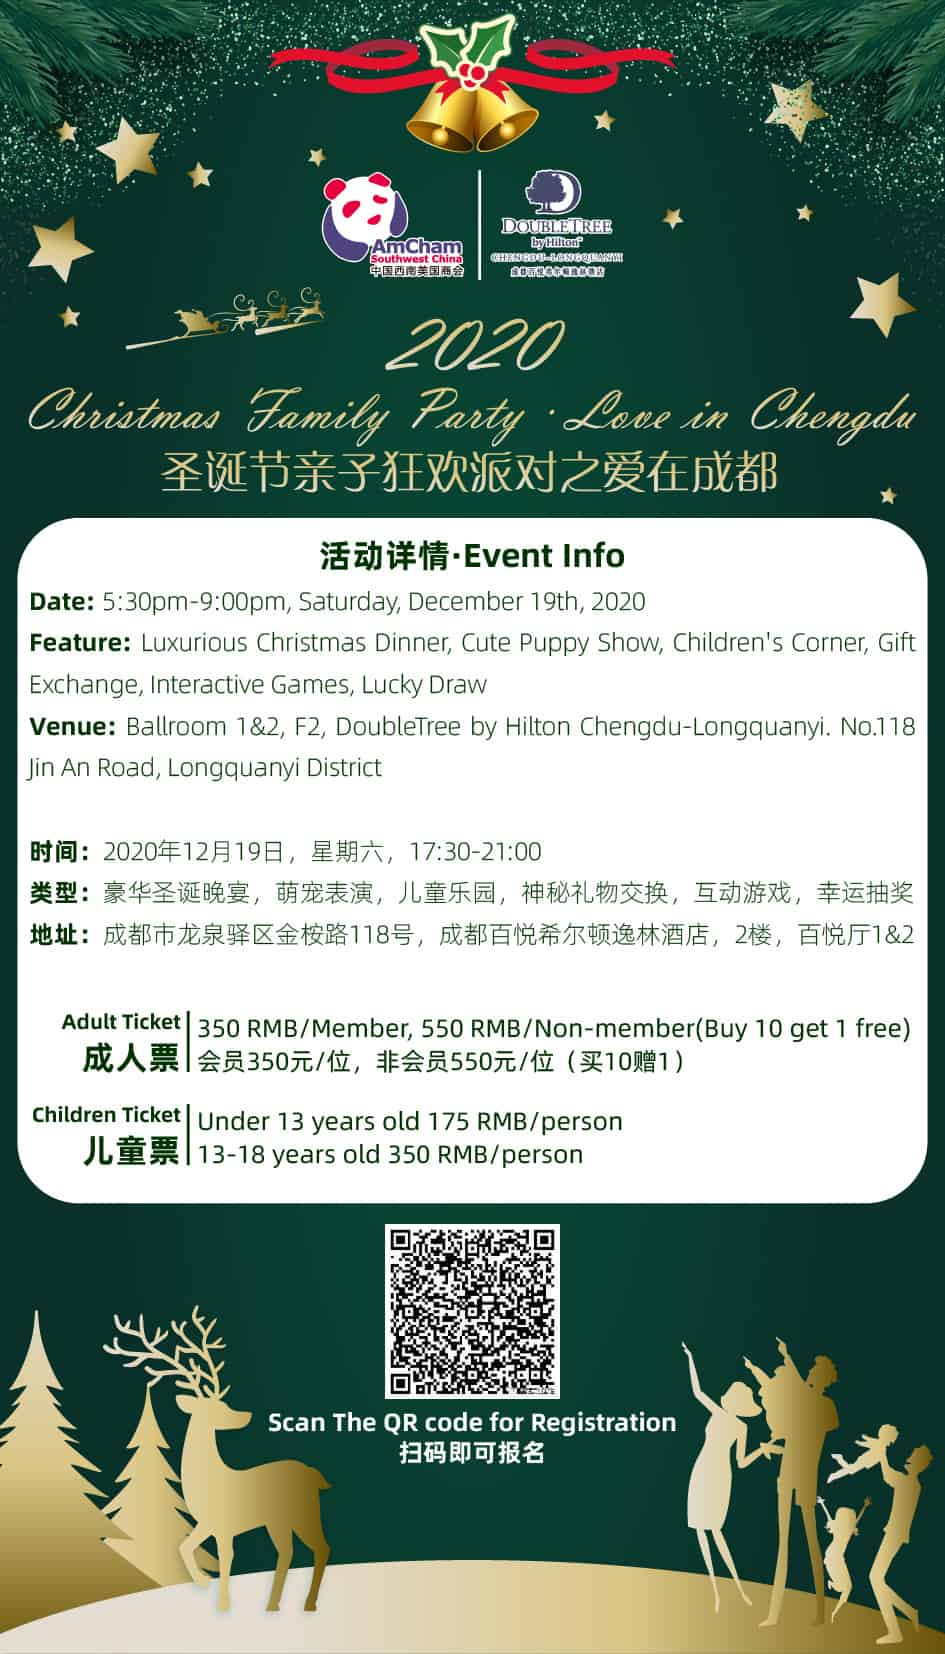 2020 AmCham Christmas Family Party · Love in Chengdu